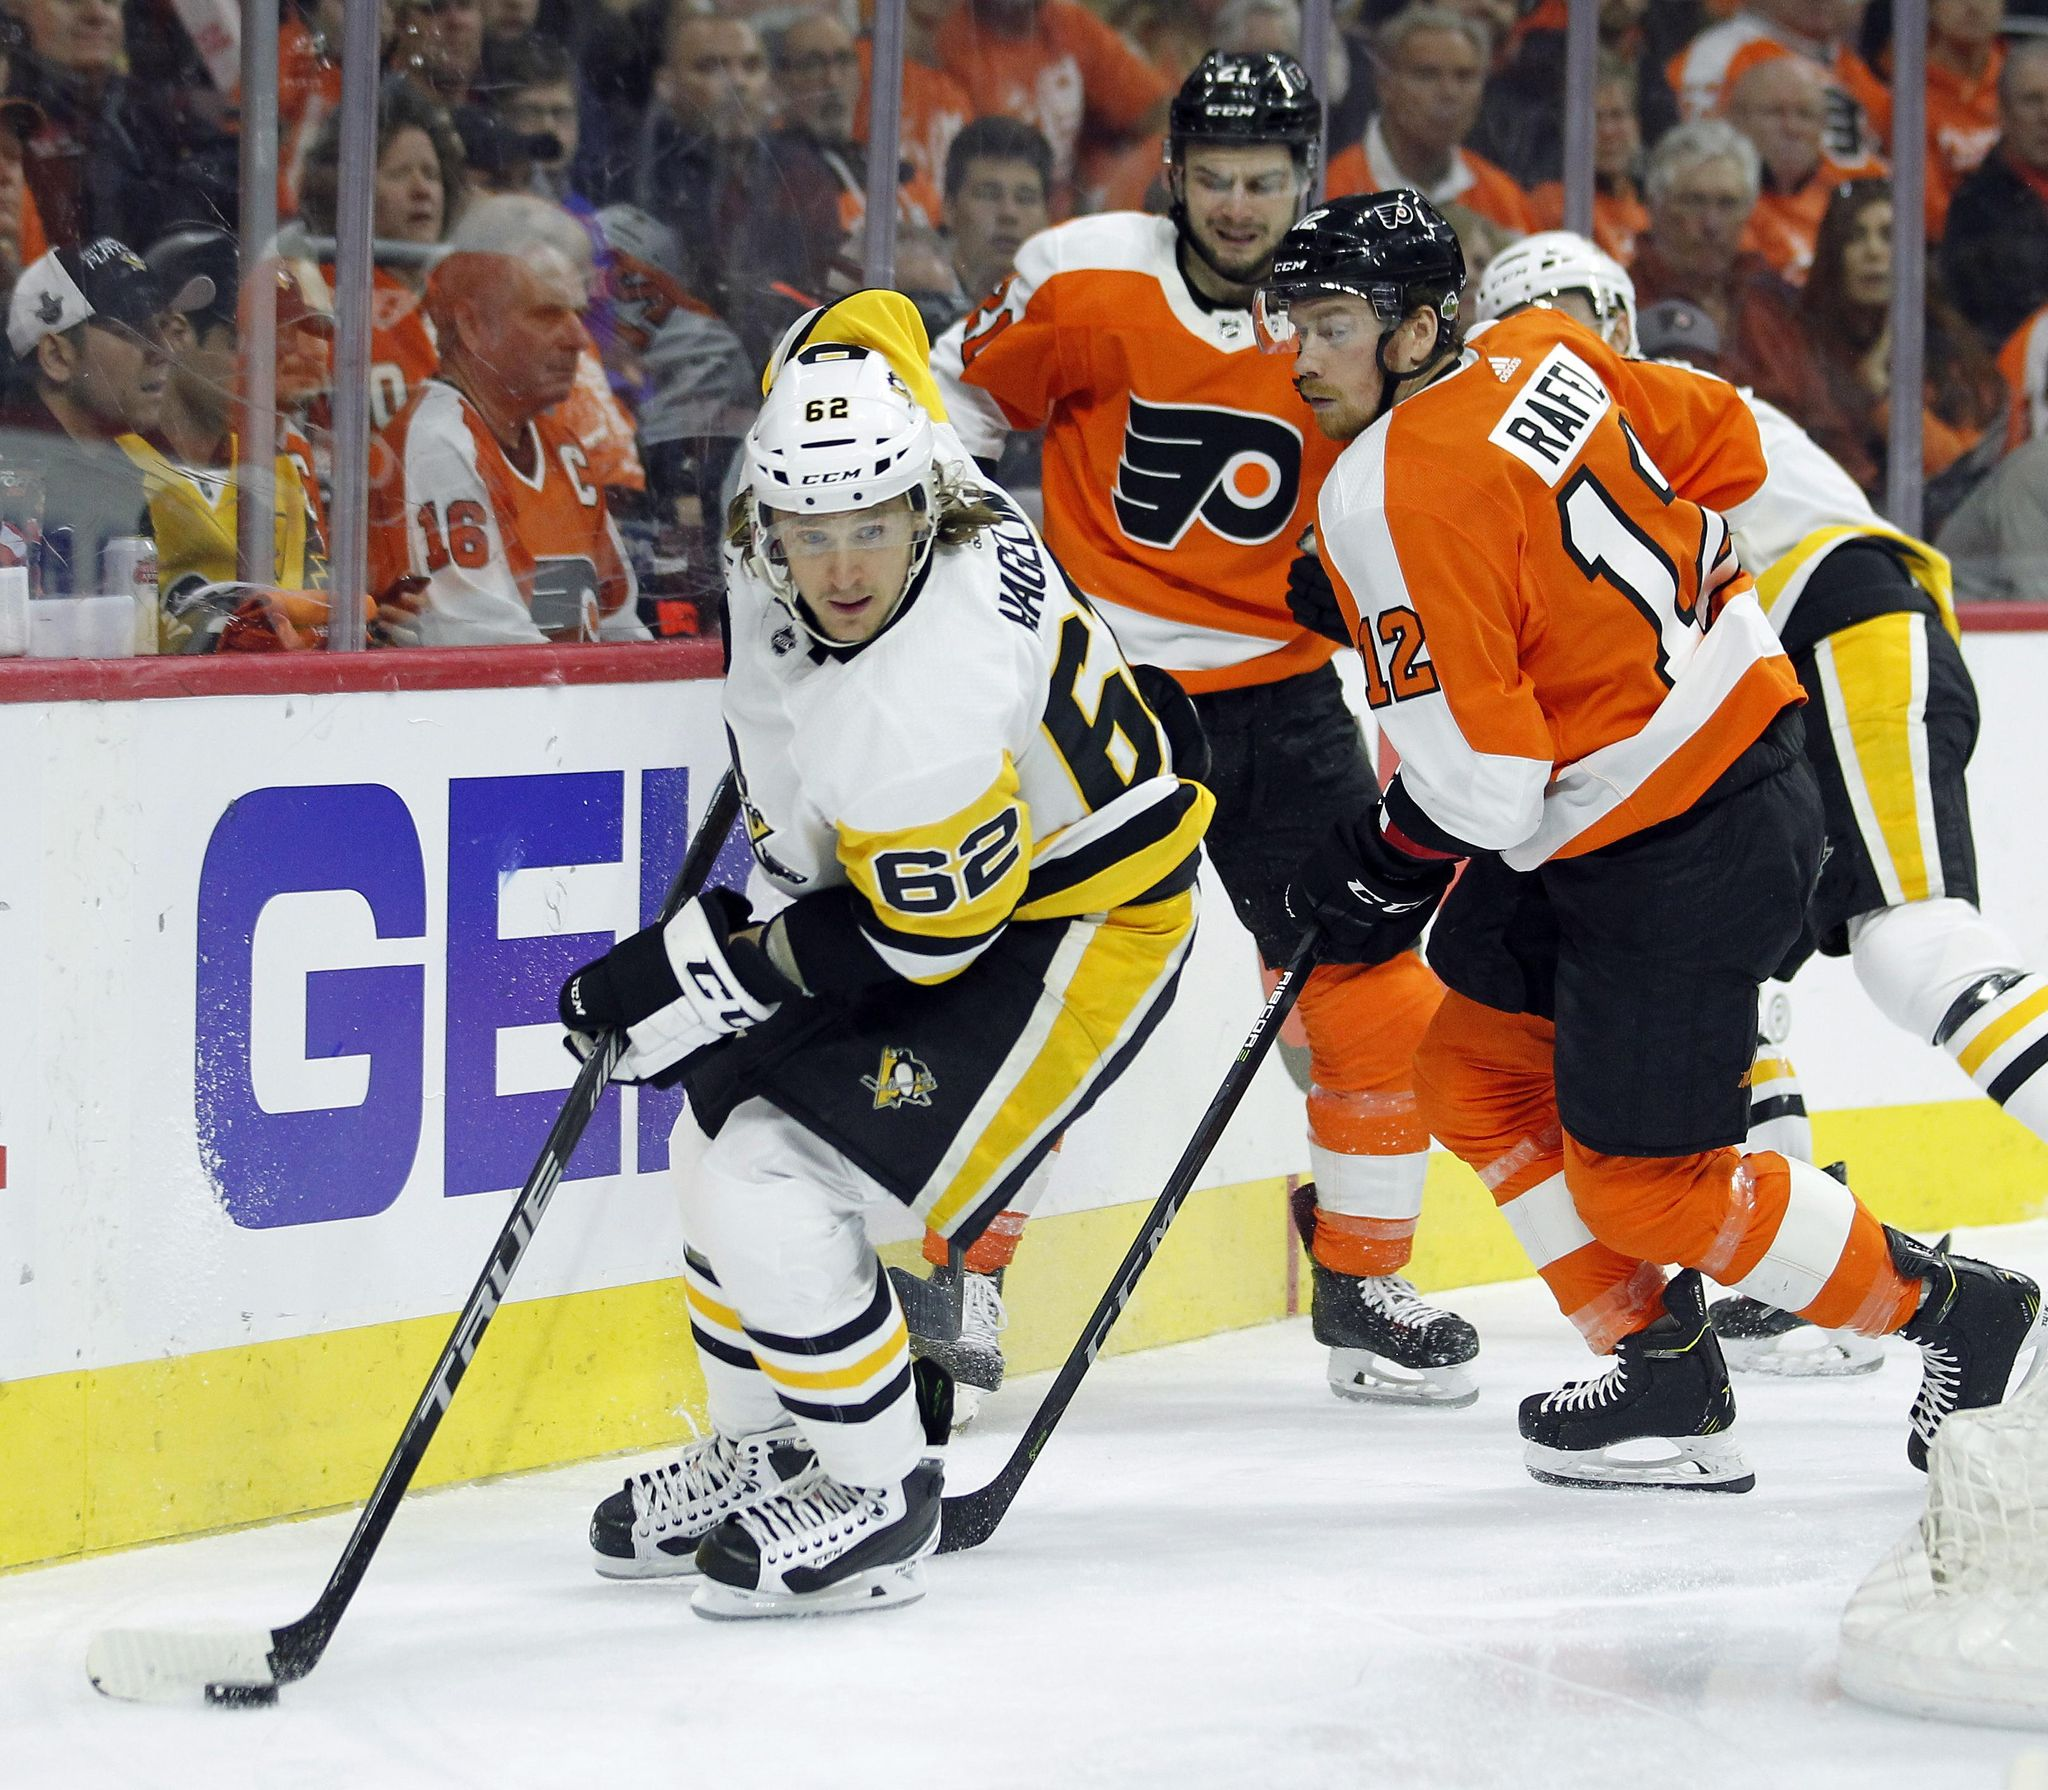 Penguins_flyers_hockey_80368_s2048x1790